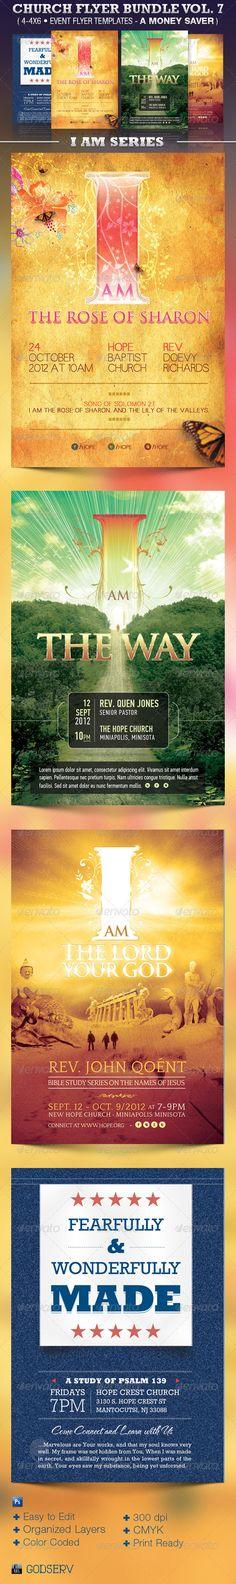 Cabaret Show Flyer Template Graphics Print Templates Pinterest - christian flyer templates